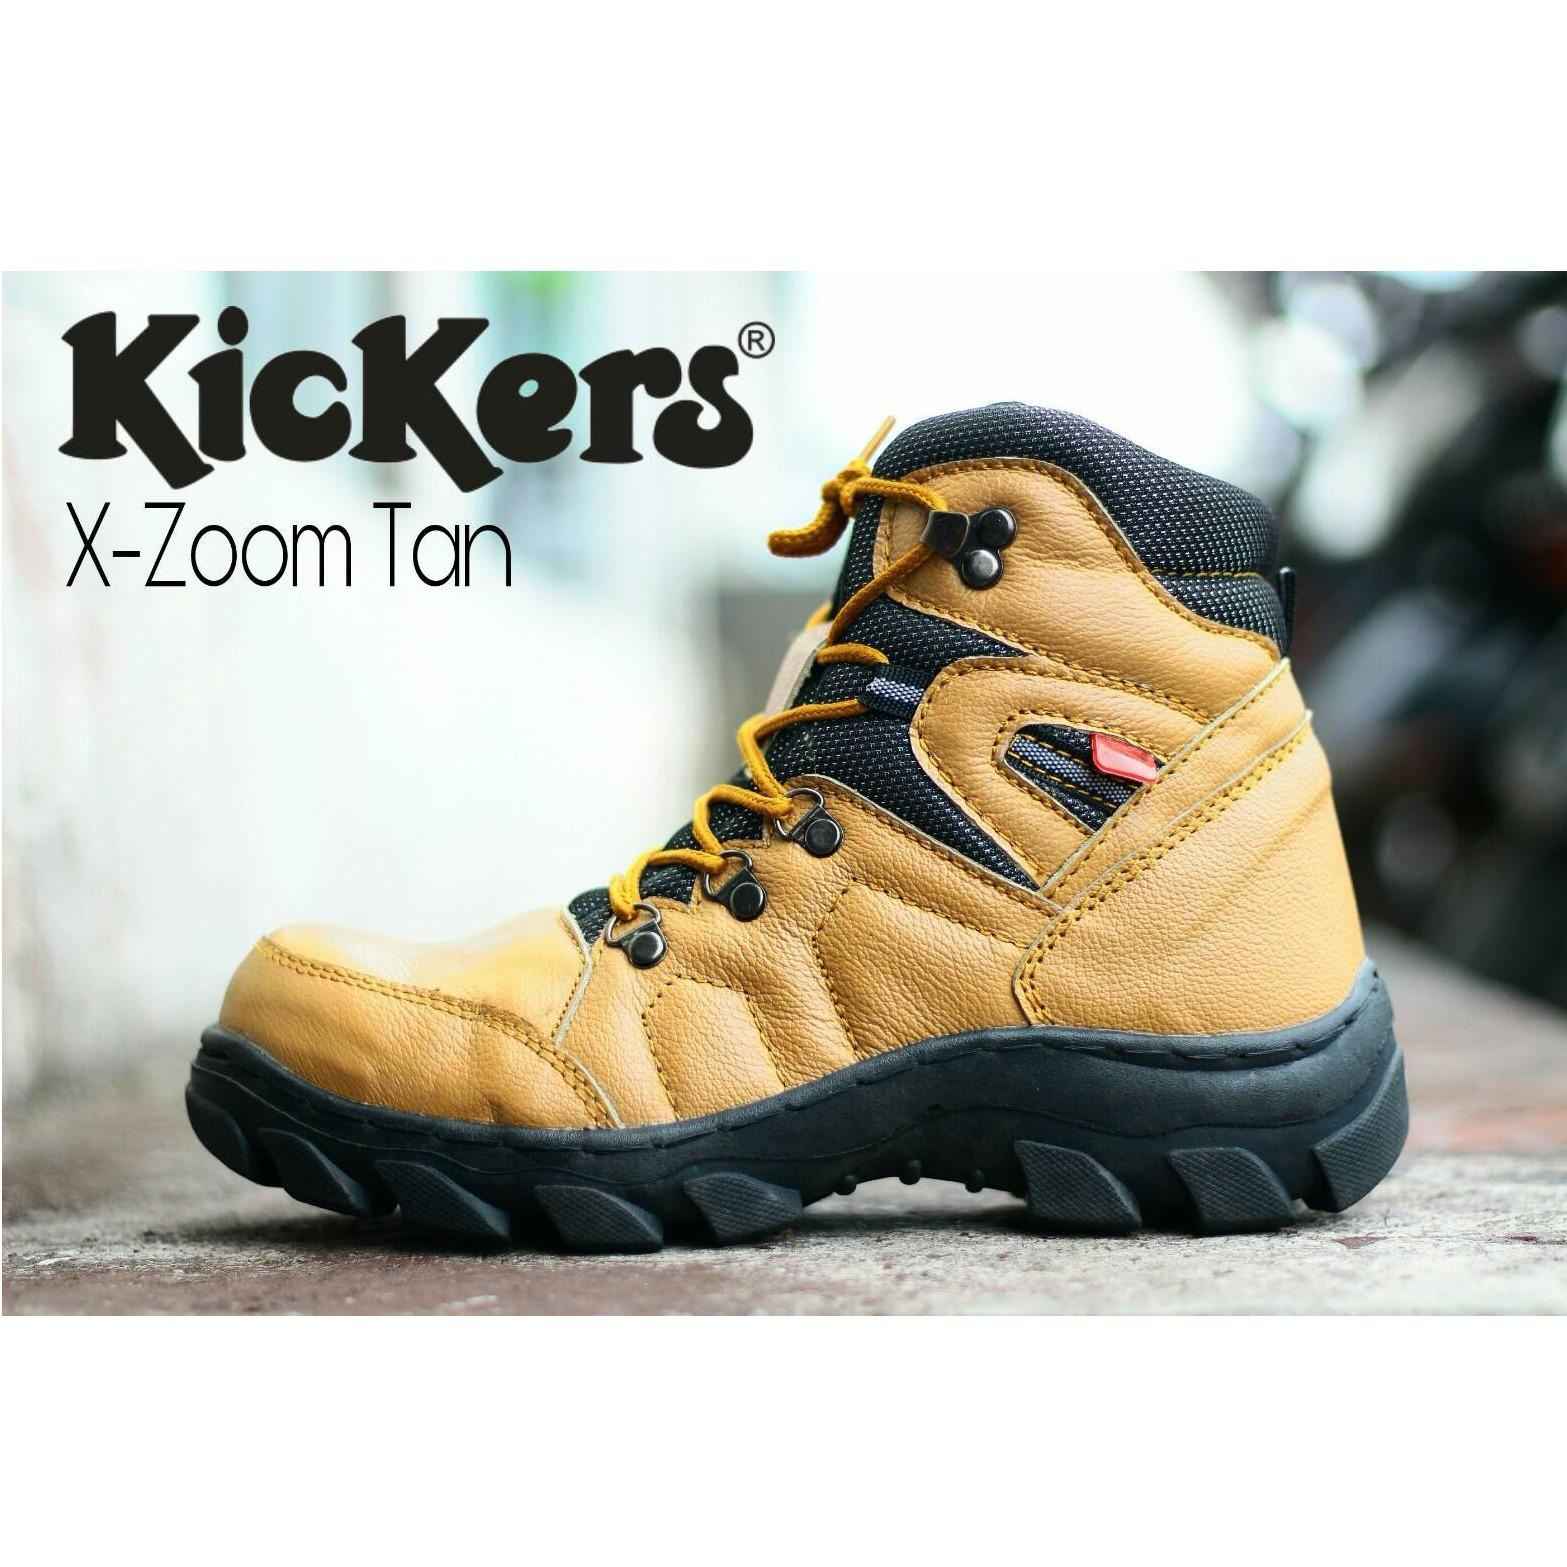 KICKERS - Sepatu Boots Pria Keren Sepatu KICKERS Safety KULIT Sepatu gunung haiking (KICKERS LOKAL)